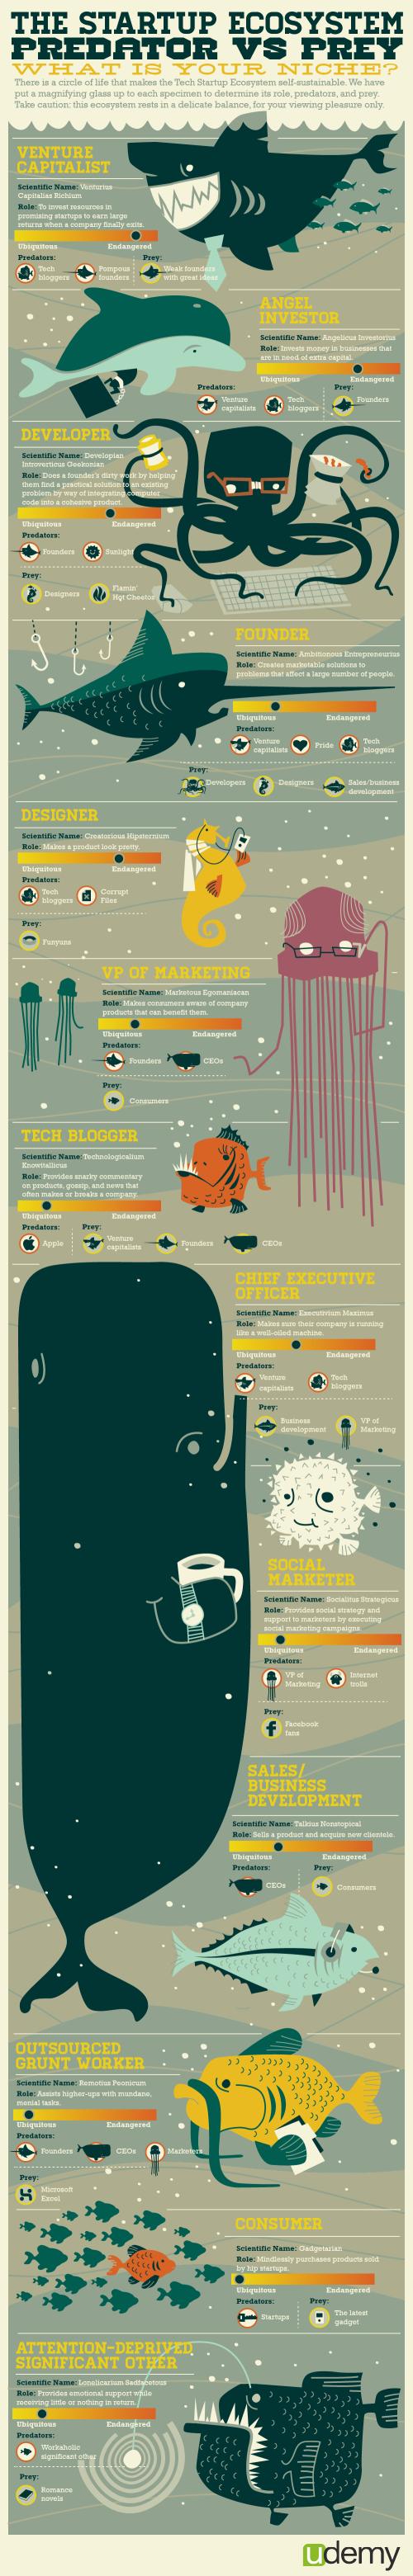 The Startup Ecosystem: Predator vs. Prey